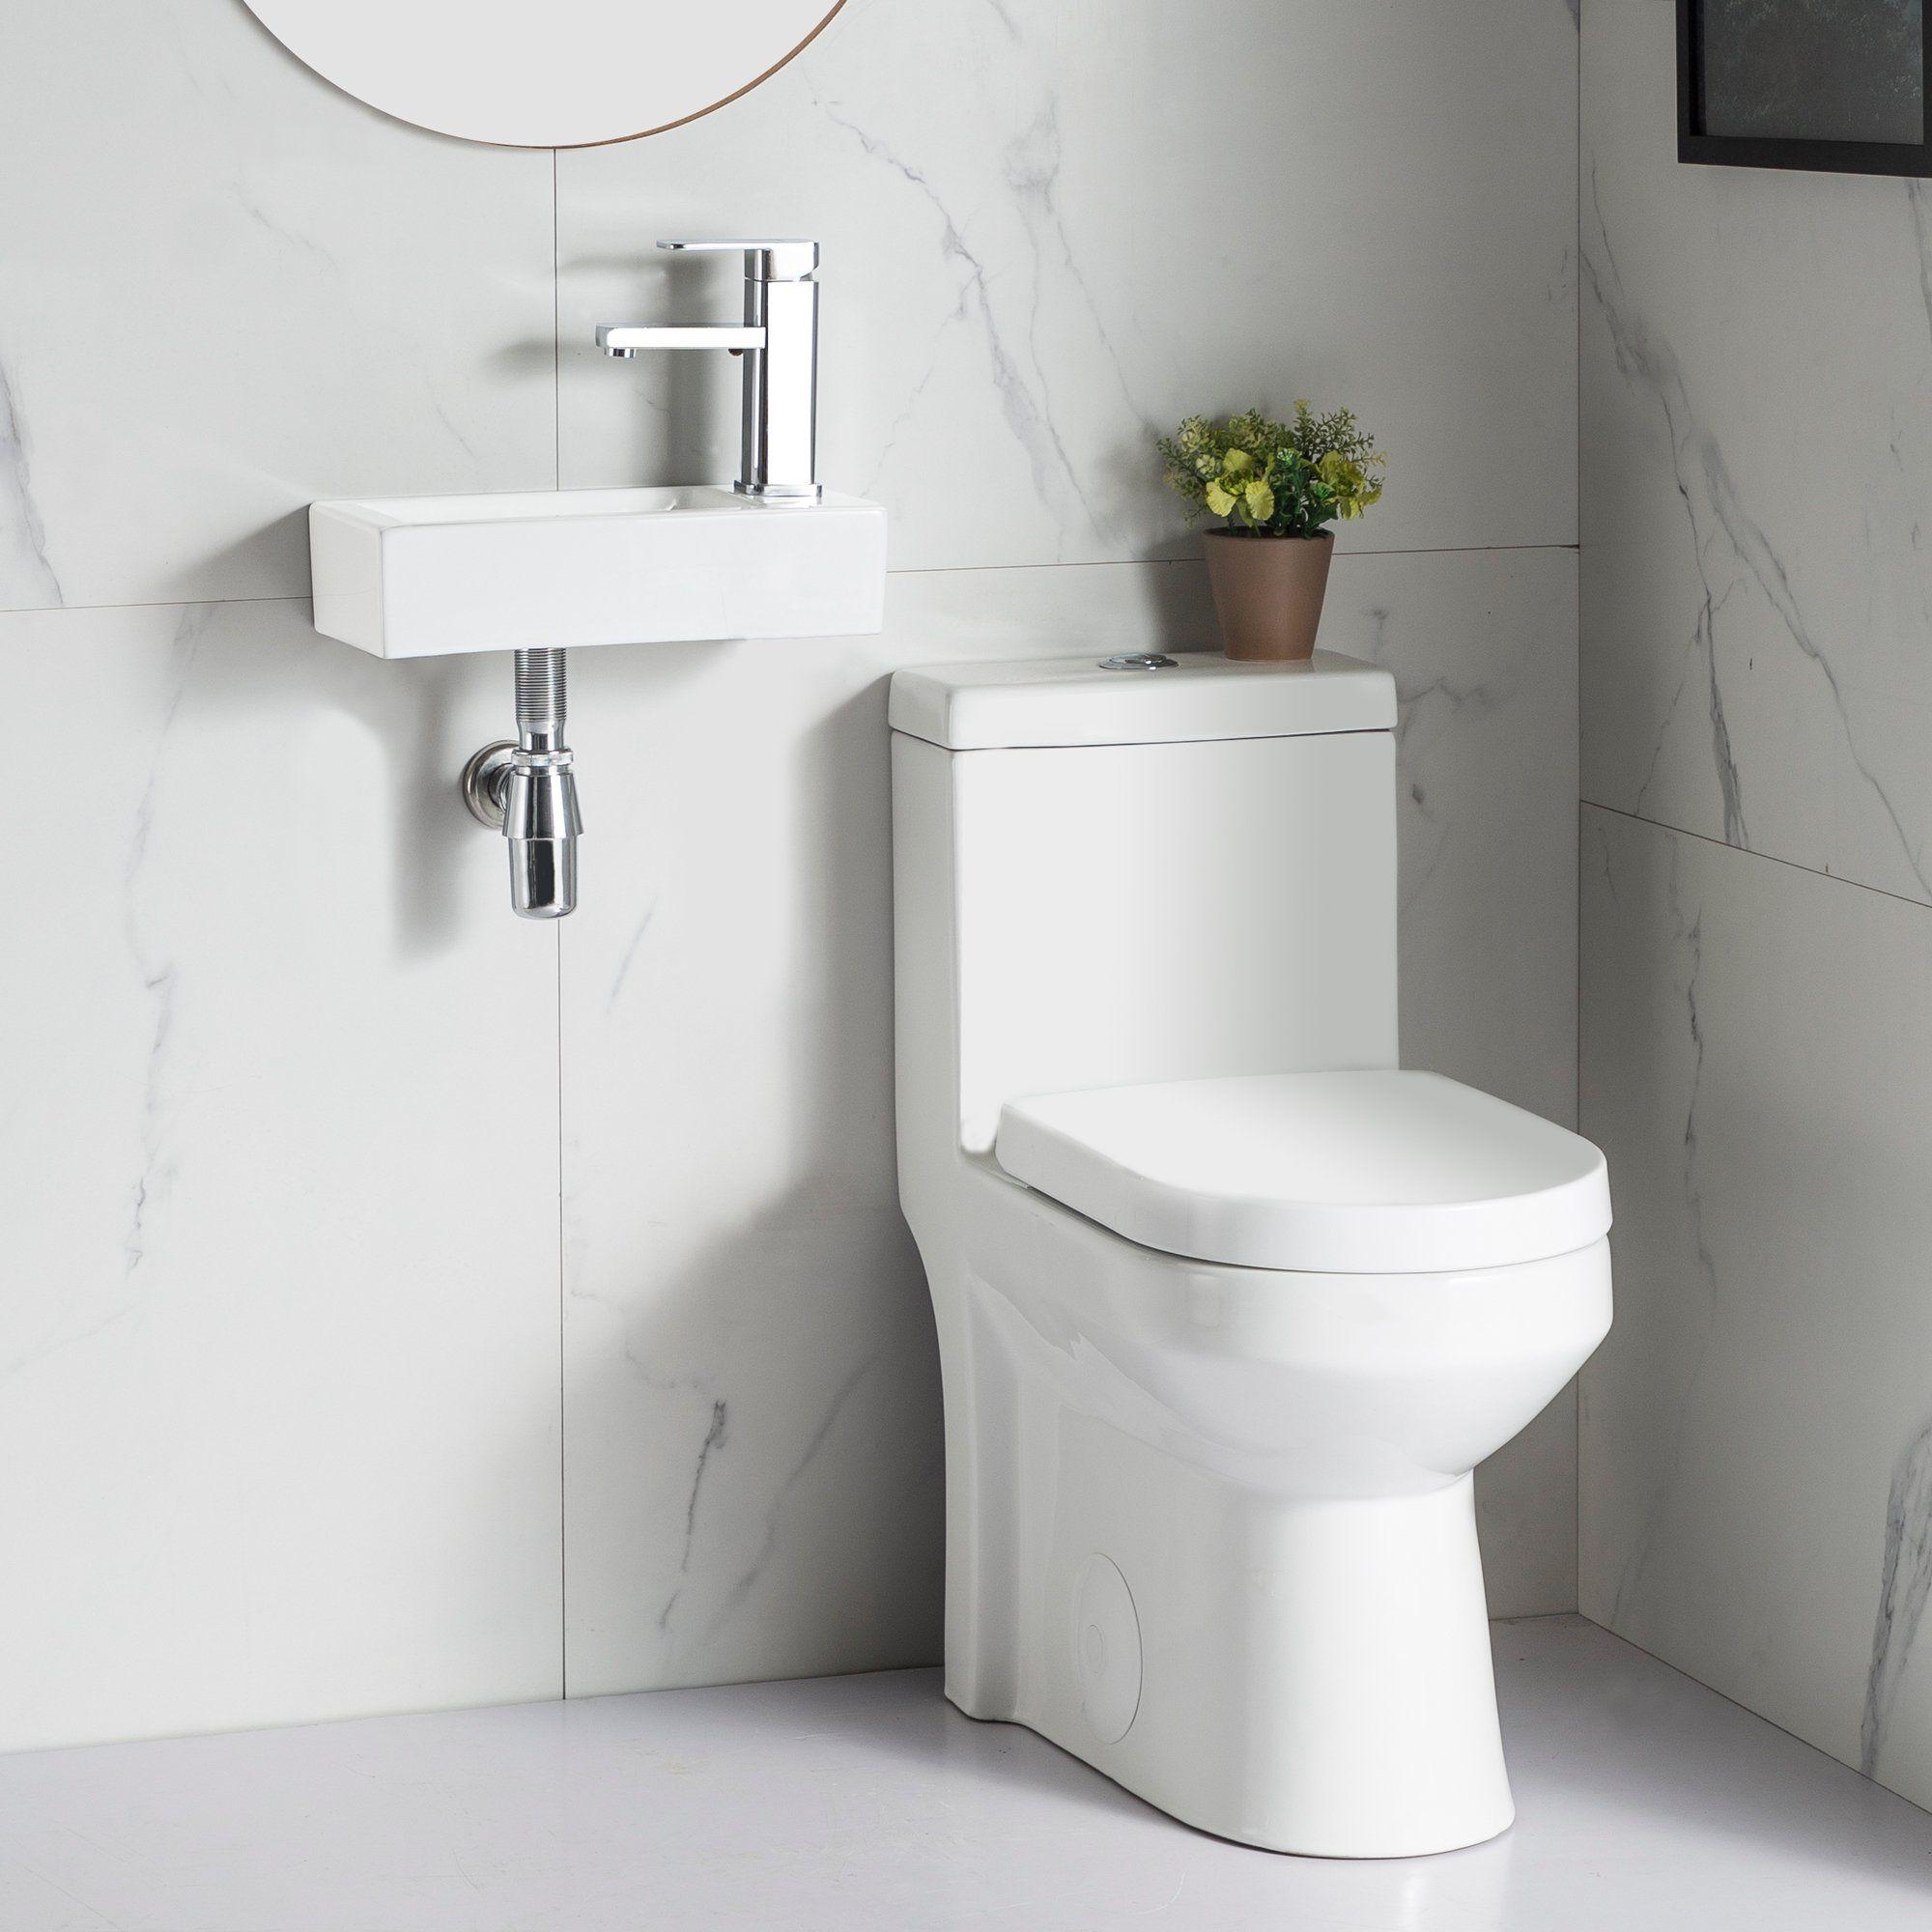 Deervalley Dv 1v081r White Ceramic Rectangular Wall Mounted Bathroom Sink Walmart Com In 2021 Wall Mounted Bathroom Sinks Wall Mounted Bathroom Sink Small Bathroom Sinks [ 2000 x 2000 Pixel ]